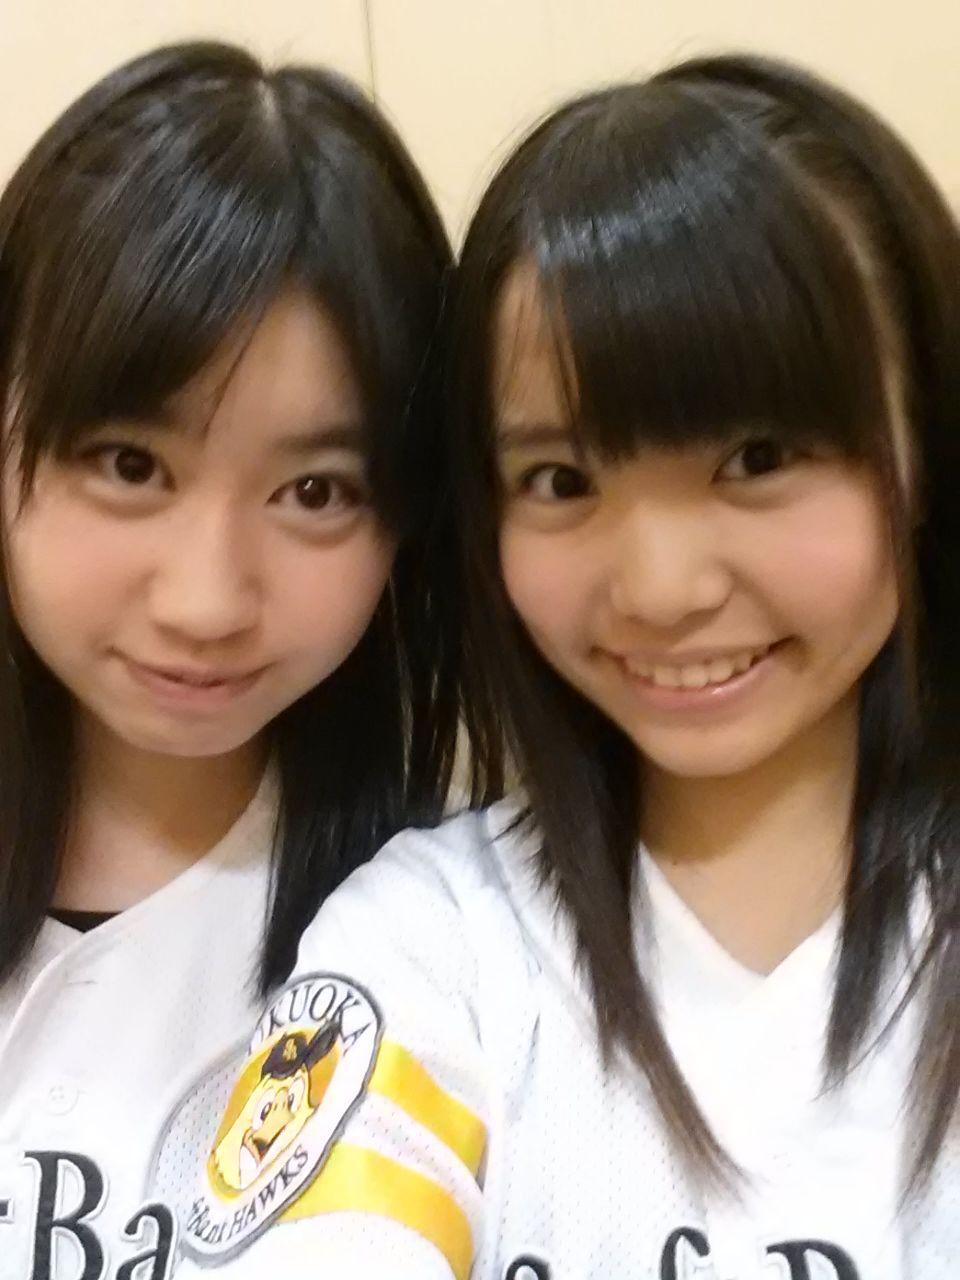 http://livedoor.blogimg.jp/otohaeika/imgs/b/1/b1db5705.jpg